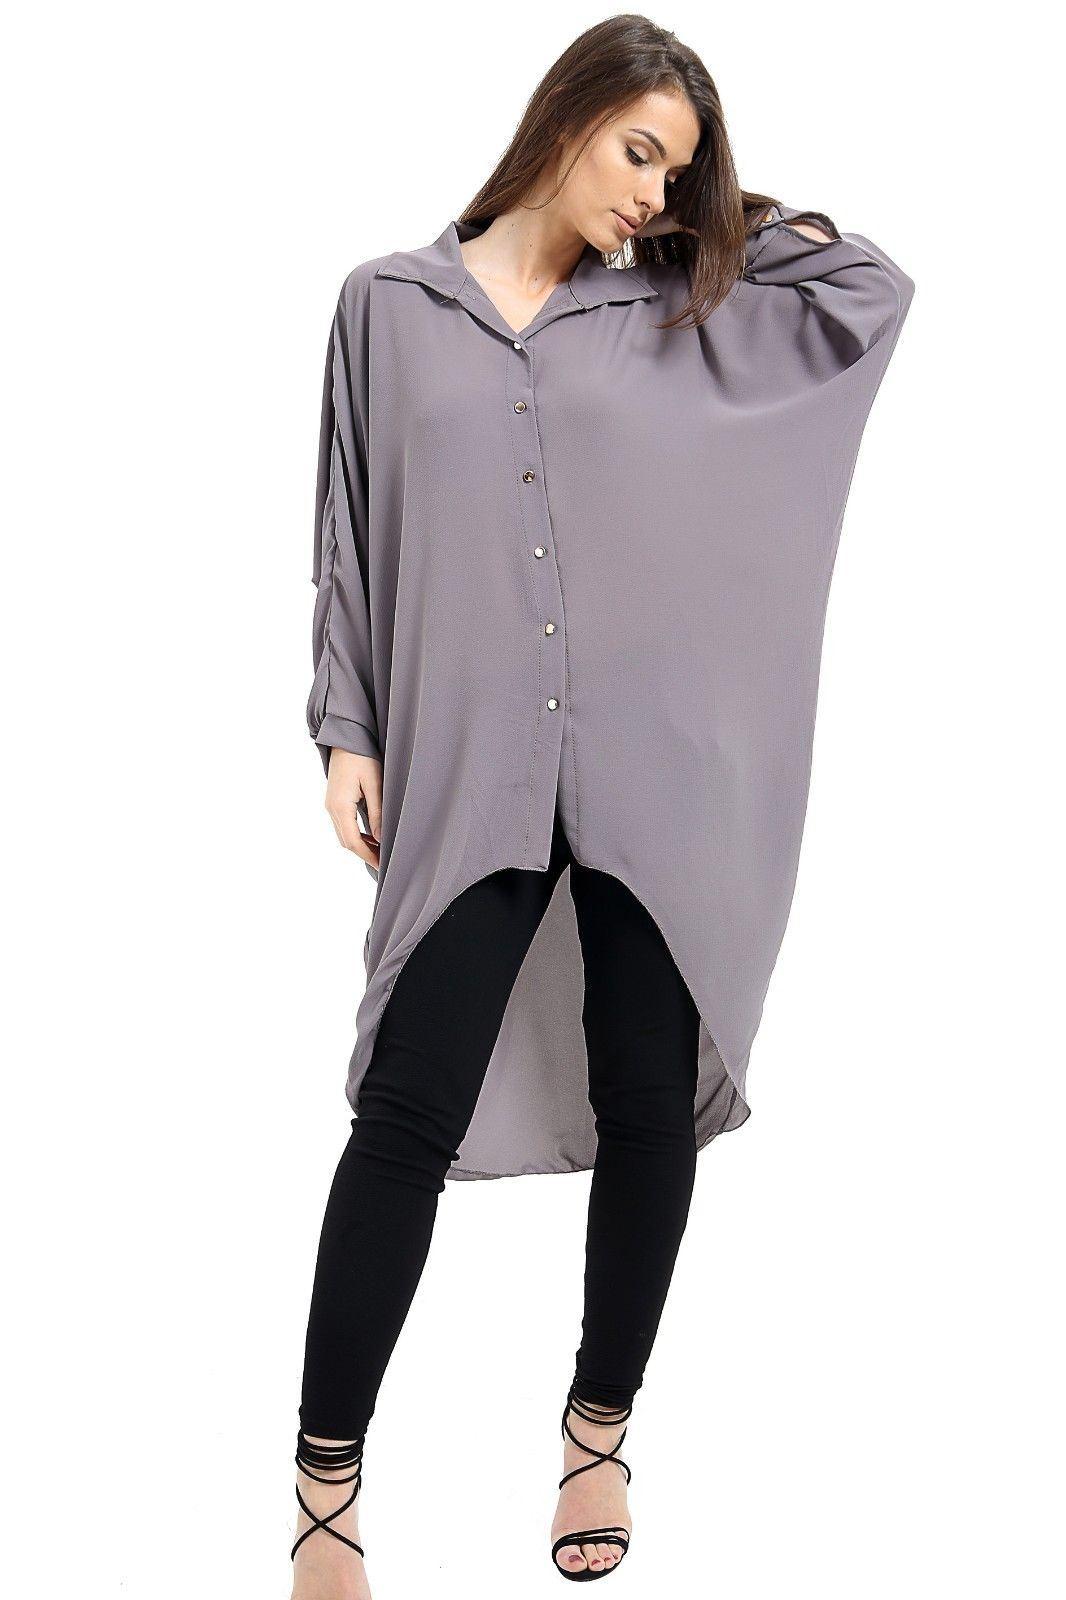 Womens Hi Lo Button Long Sleeve Collared Plain Chiffon Shirt Dress Dip Hem Top